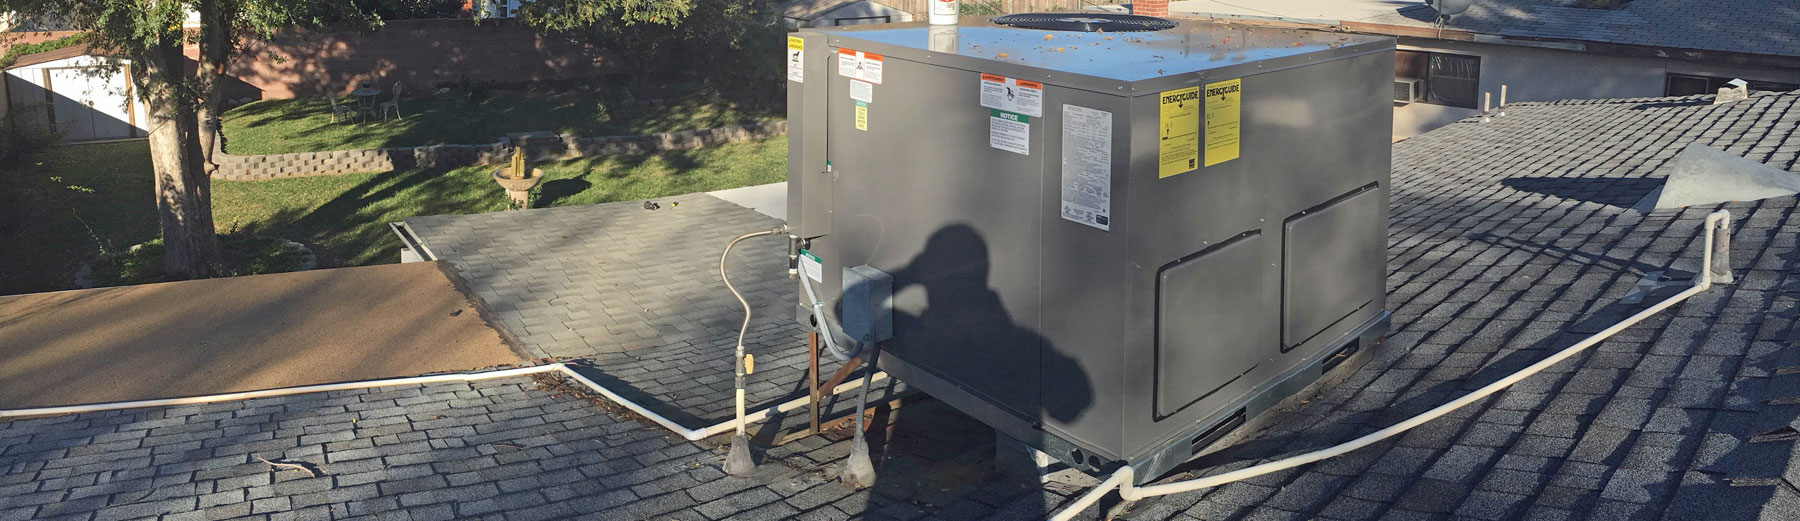 Air Conditioning Replacement San Bernardino, California